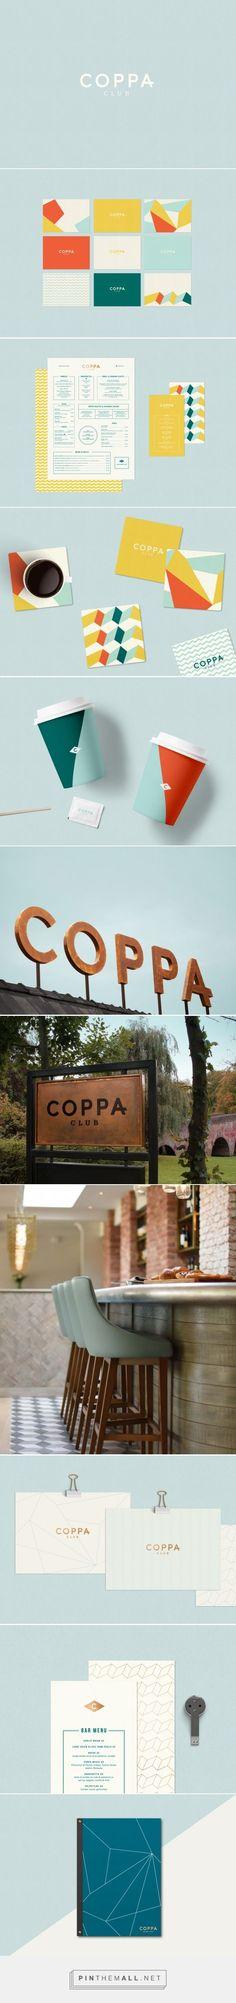 Coppa Club Branding by The Plant | Fivestar Branding – Design and Branding Agency & Inspiration Gallery #CorporateBranding